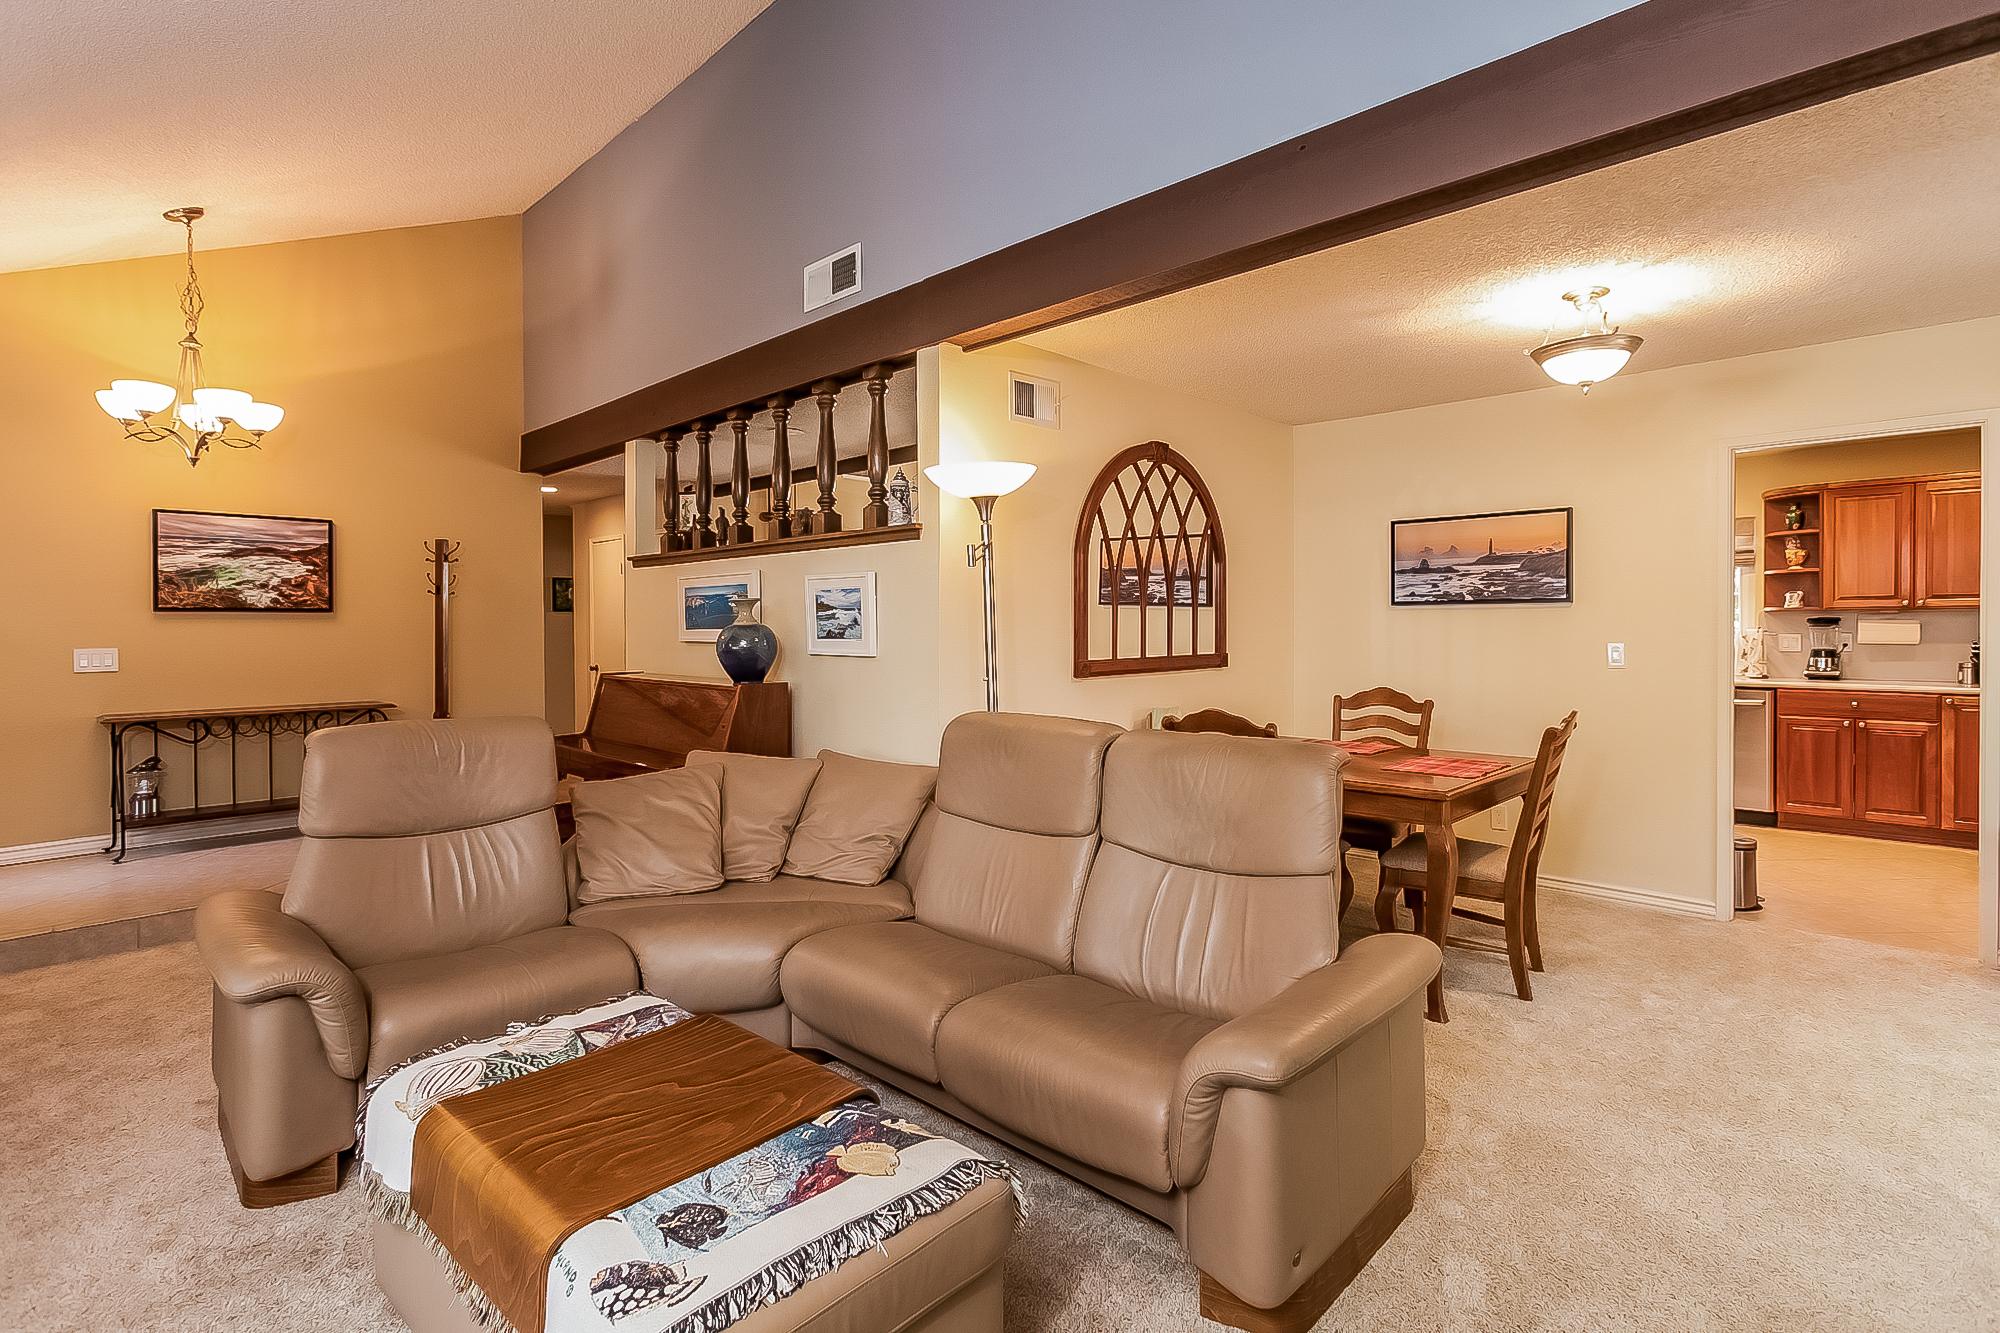 011-Living_Room-2687468-large.jpg